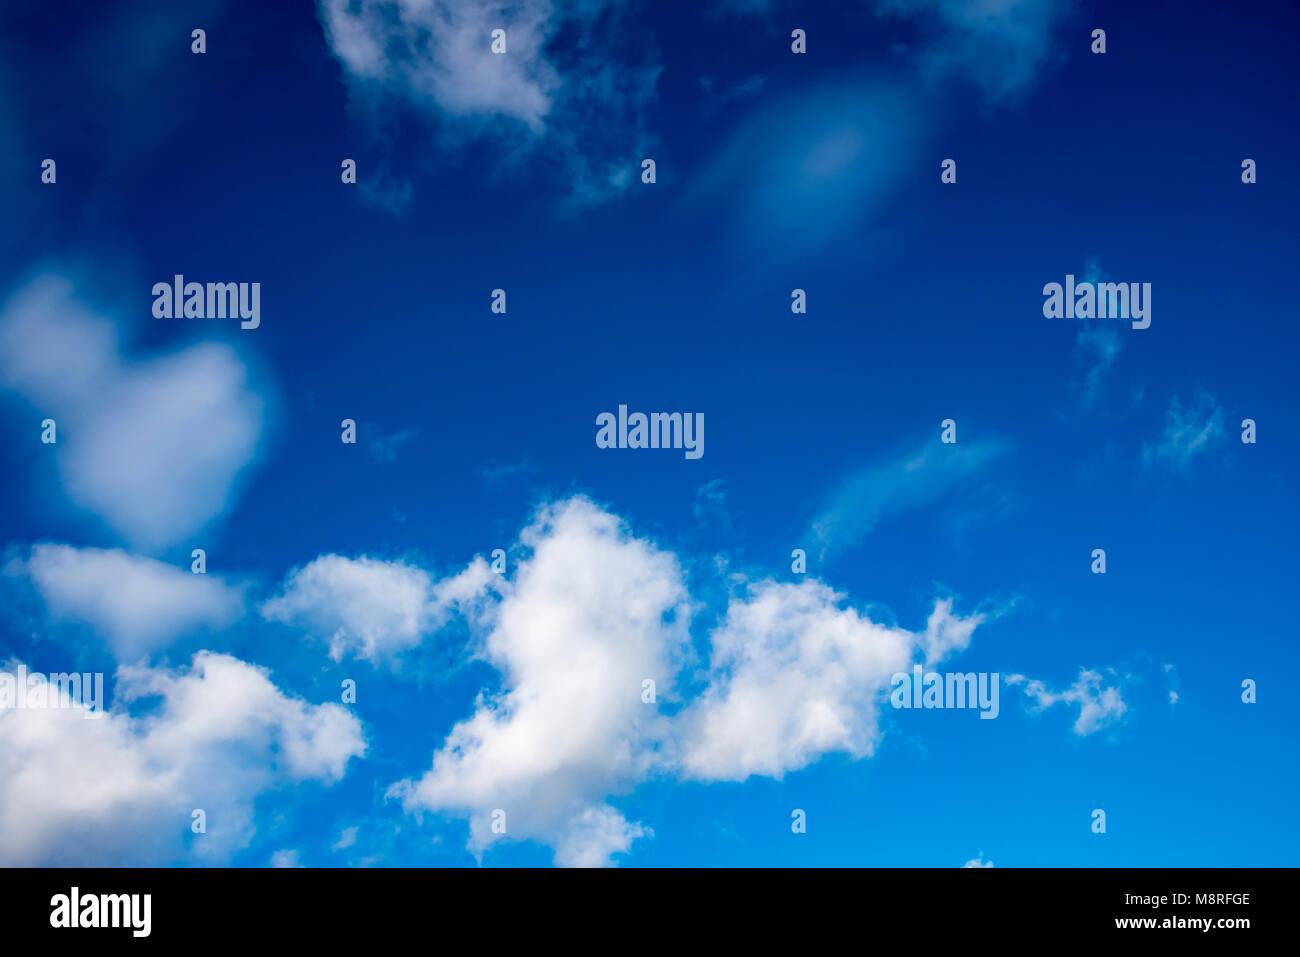 UK, WELWYN - OCTOBER 2017: Deep Blue Skies & fluffy clouds - Stock Image